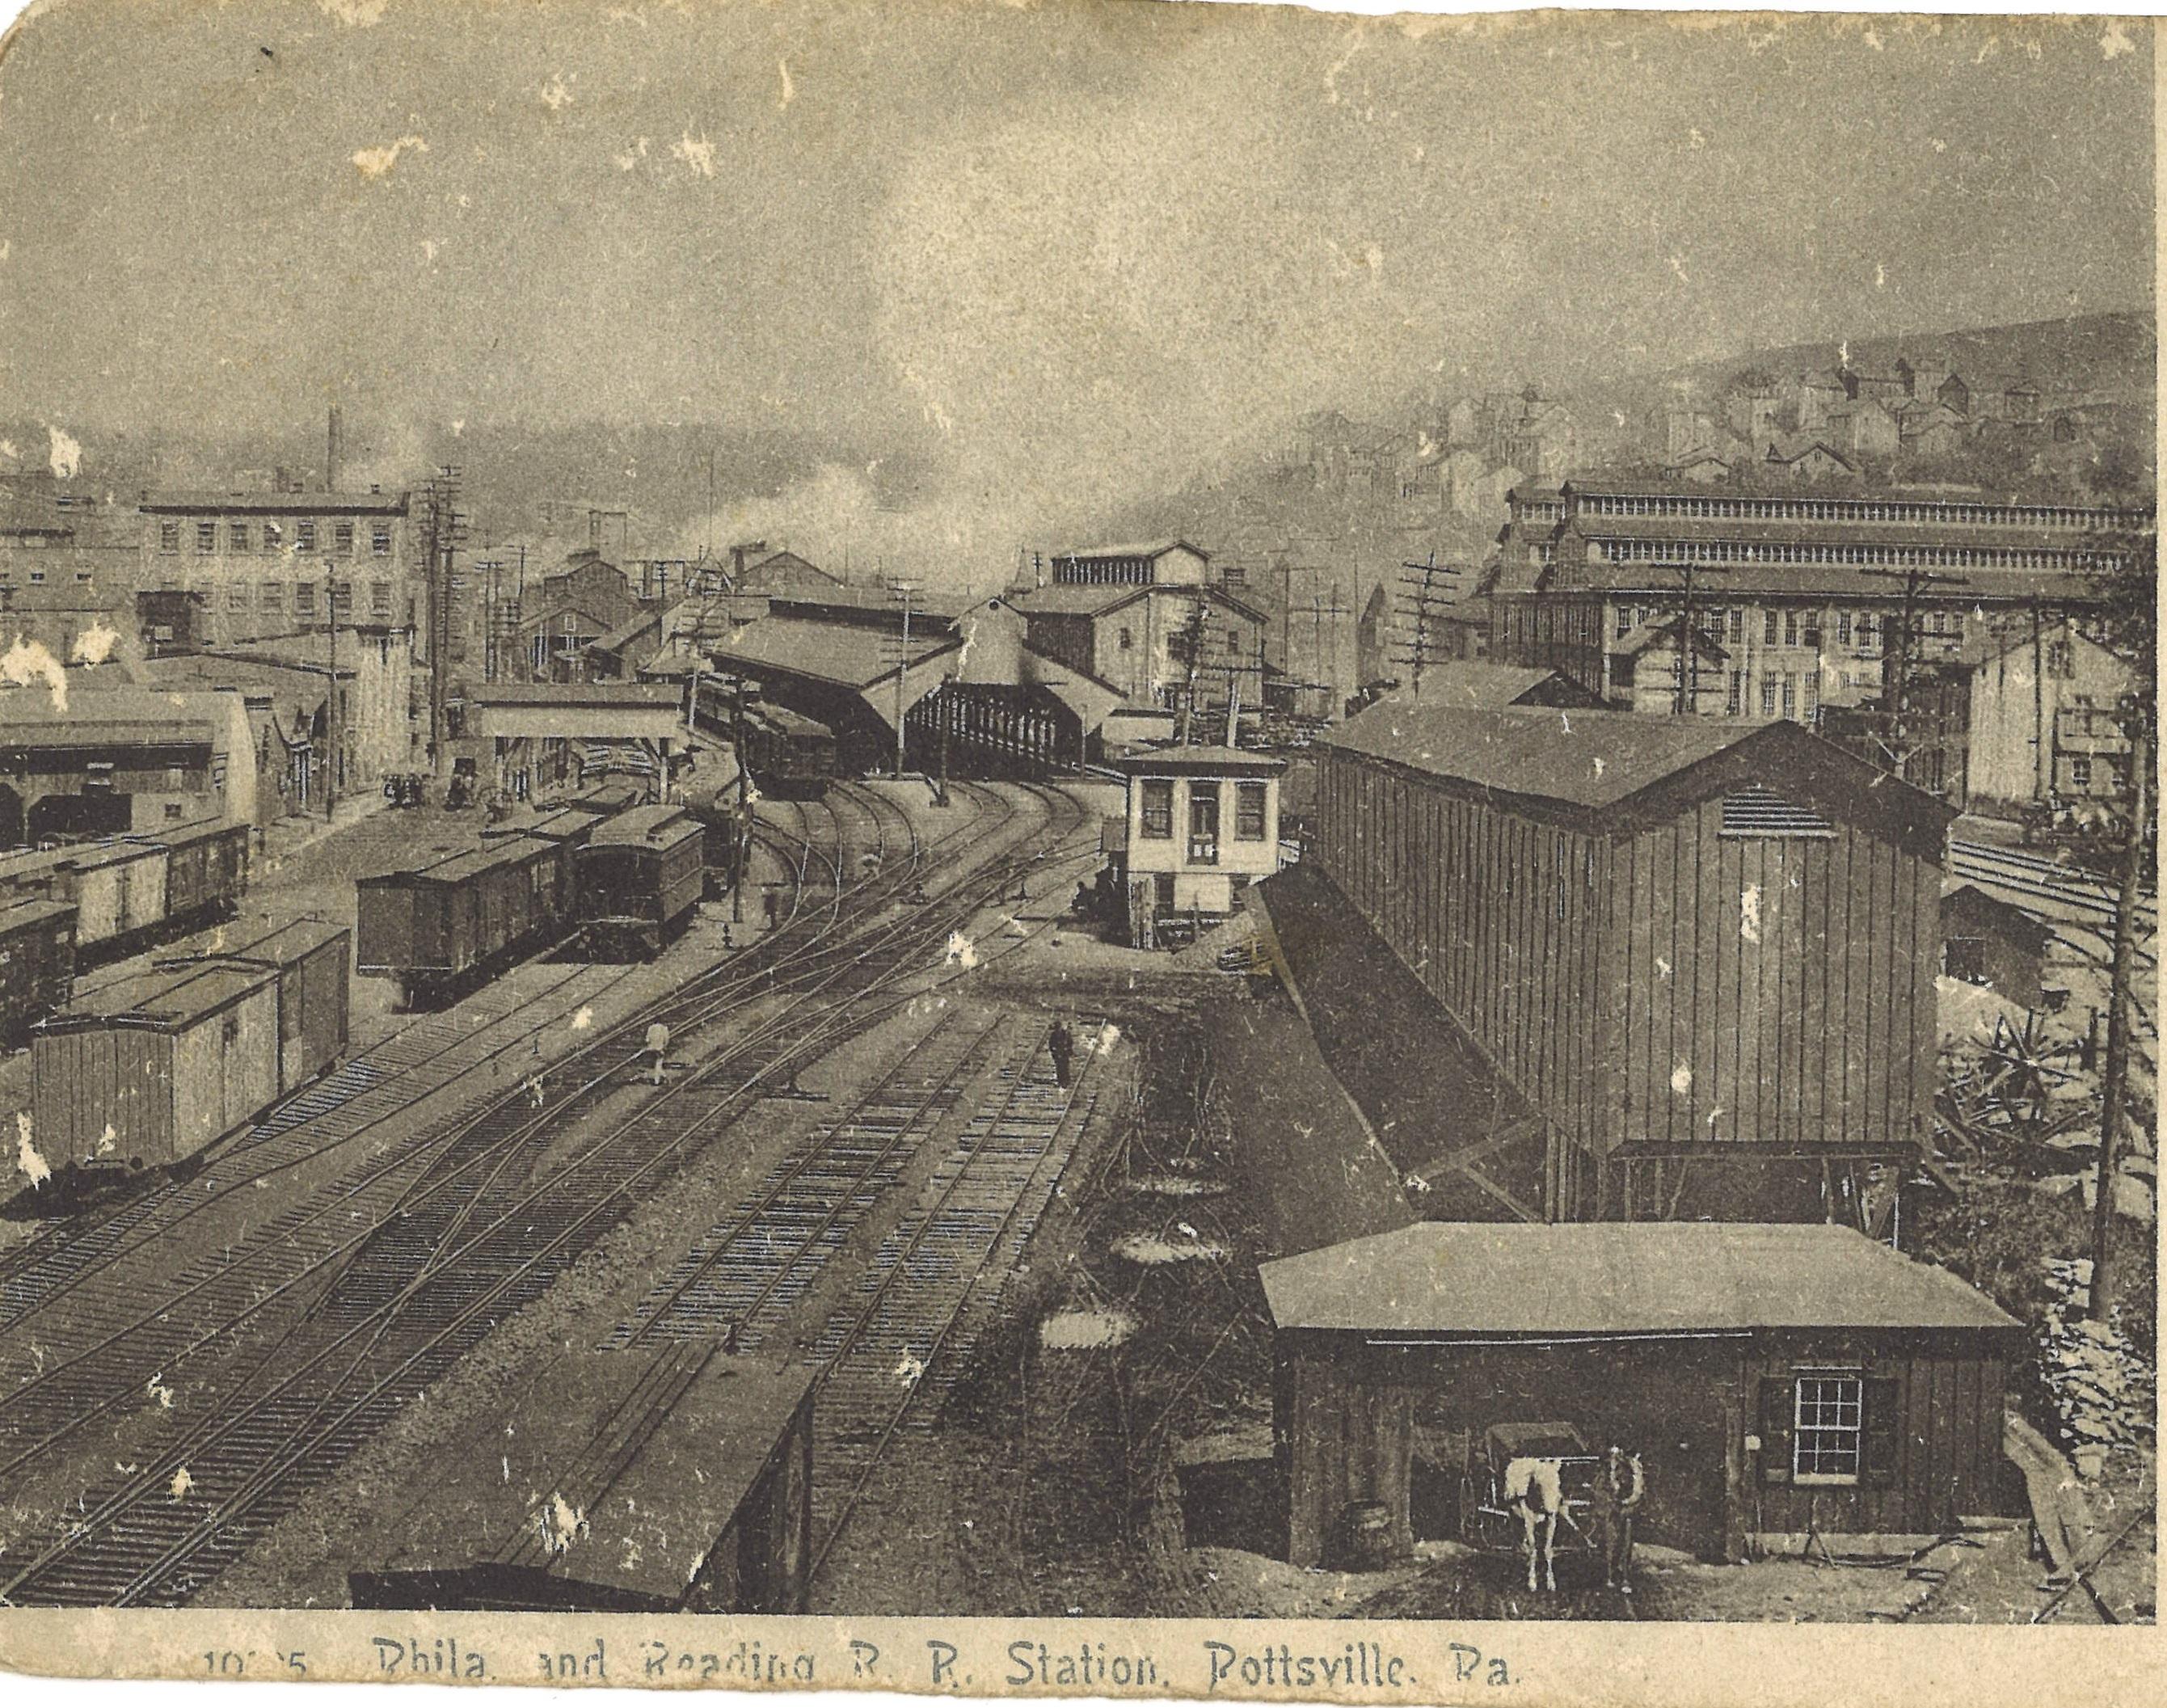 Philadelphia and Reading Depot in Pottsville